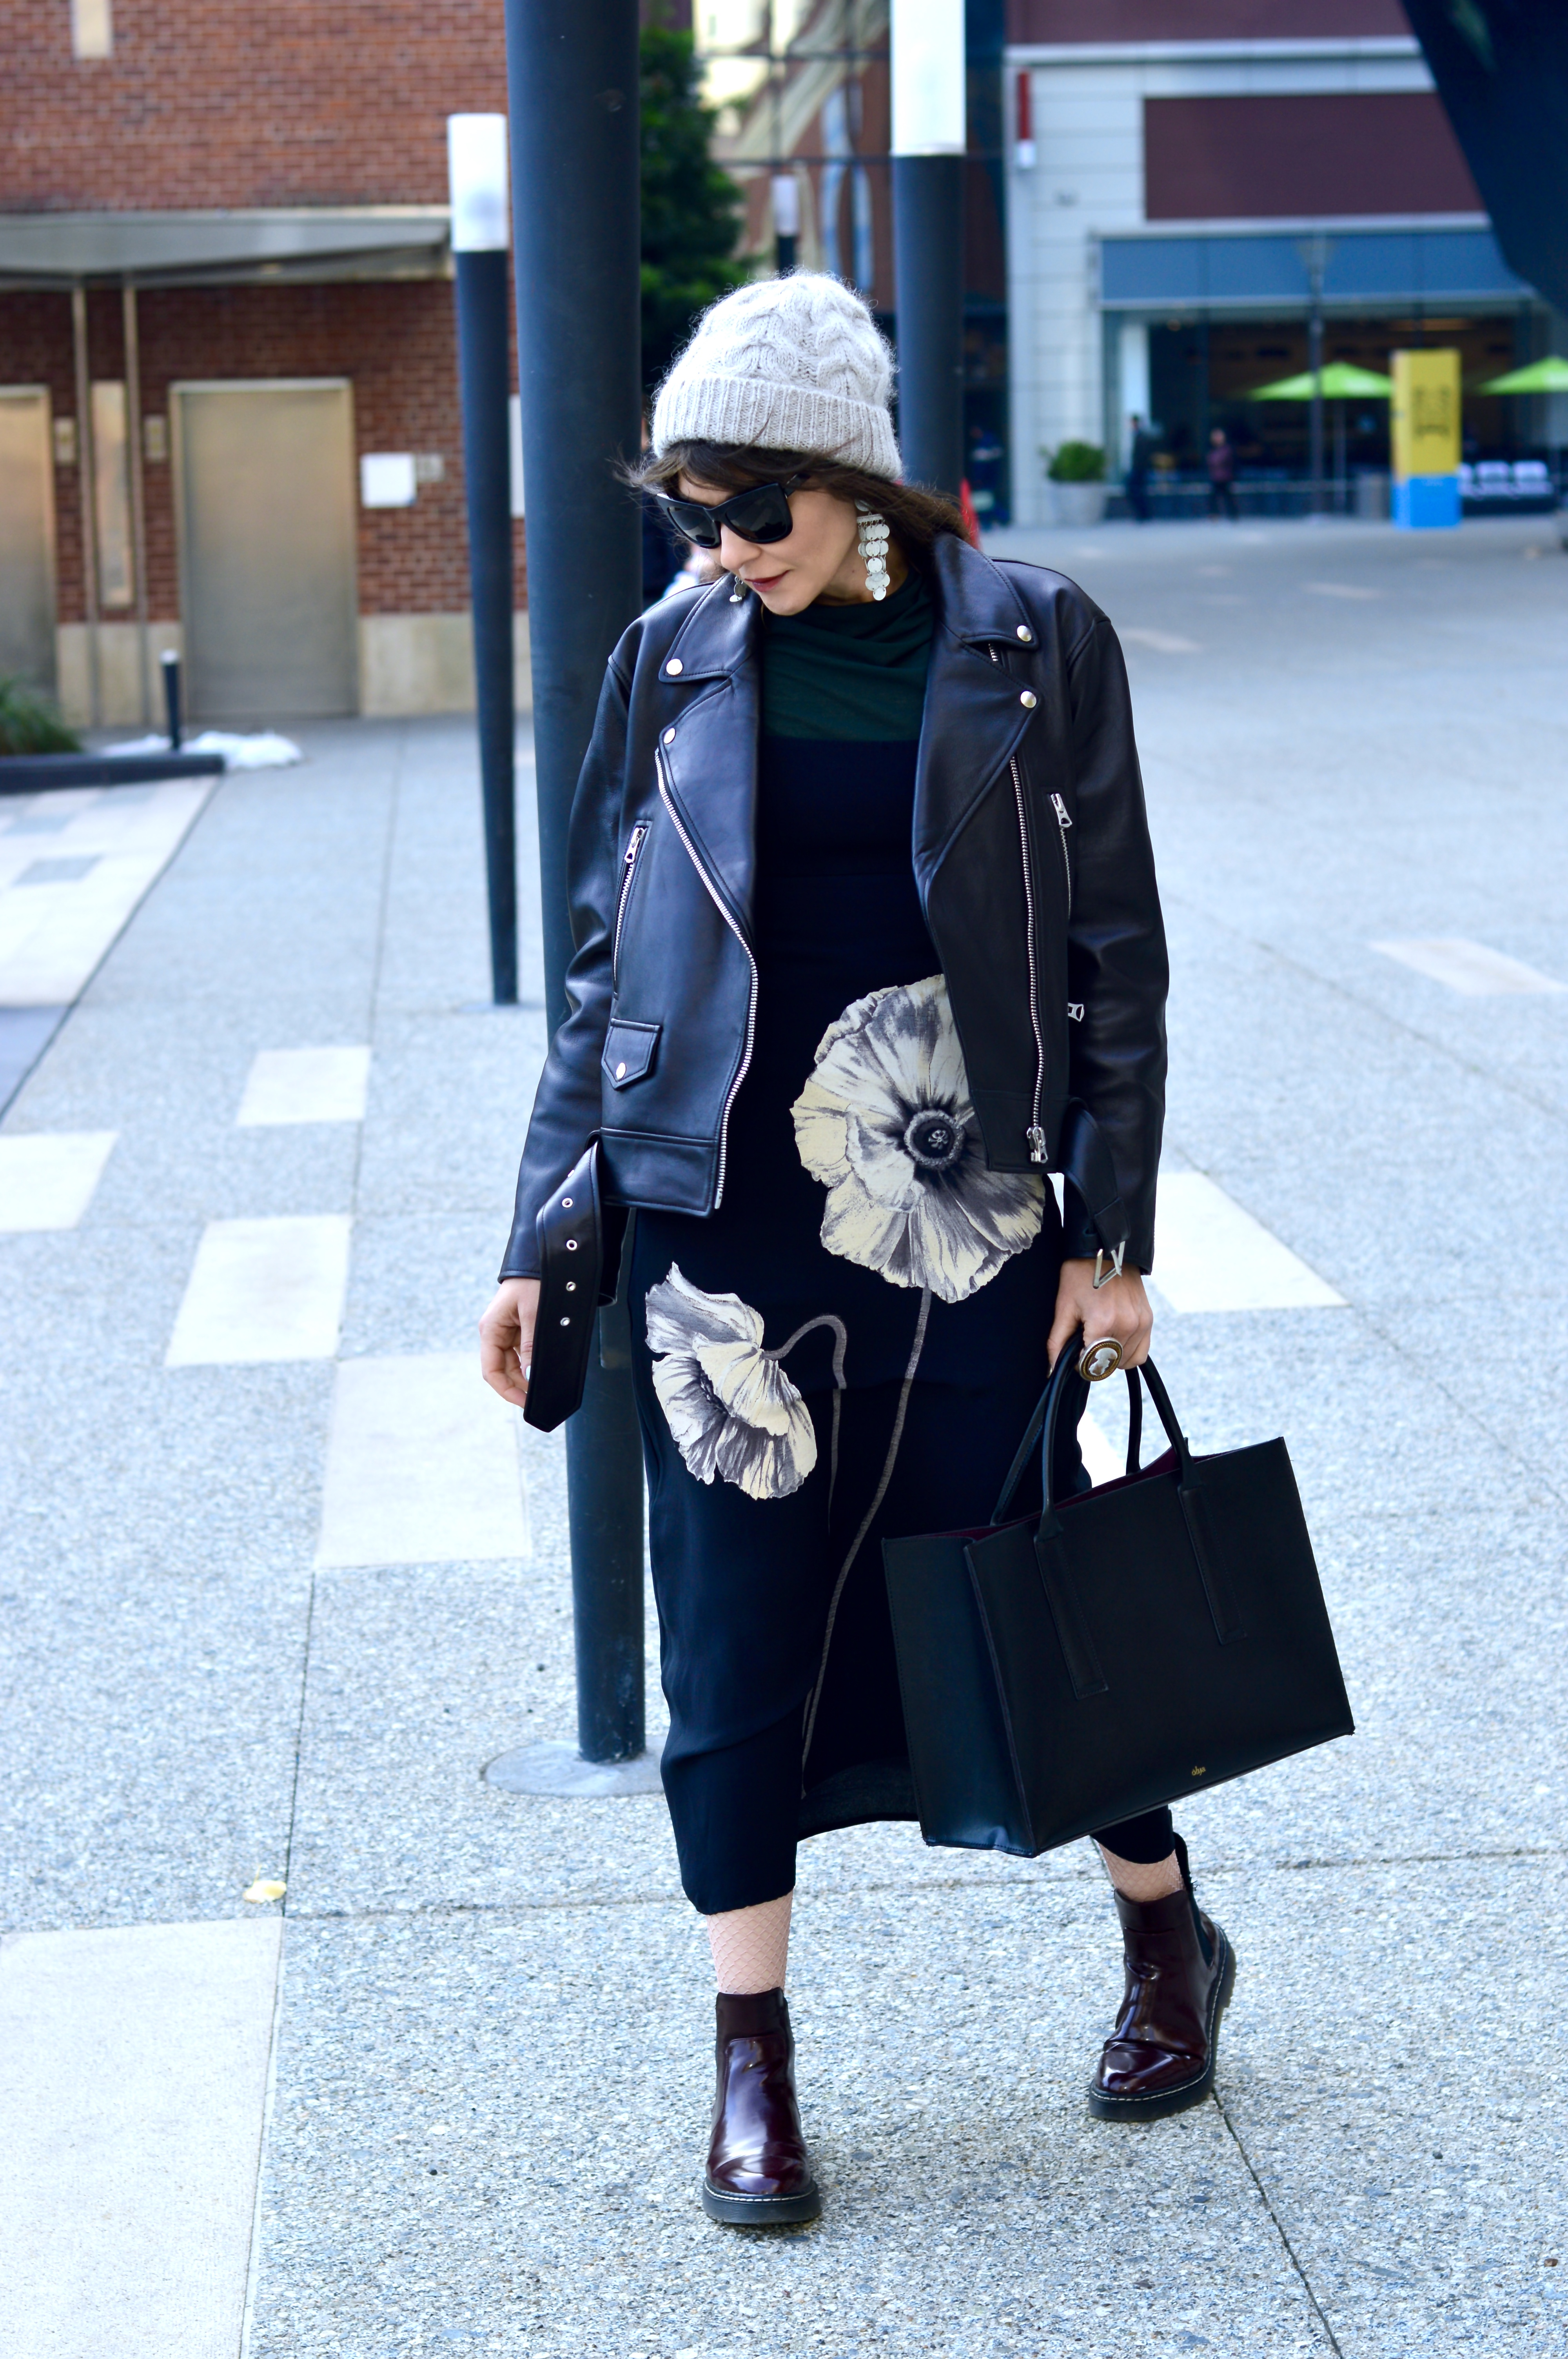 Moto jacket and floral maxi dress.